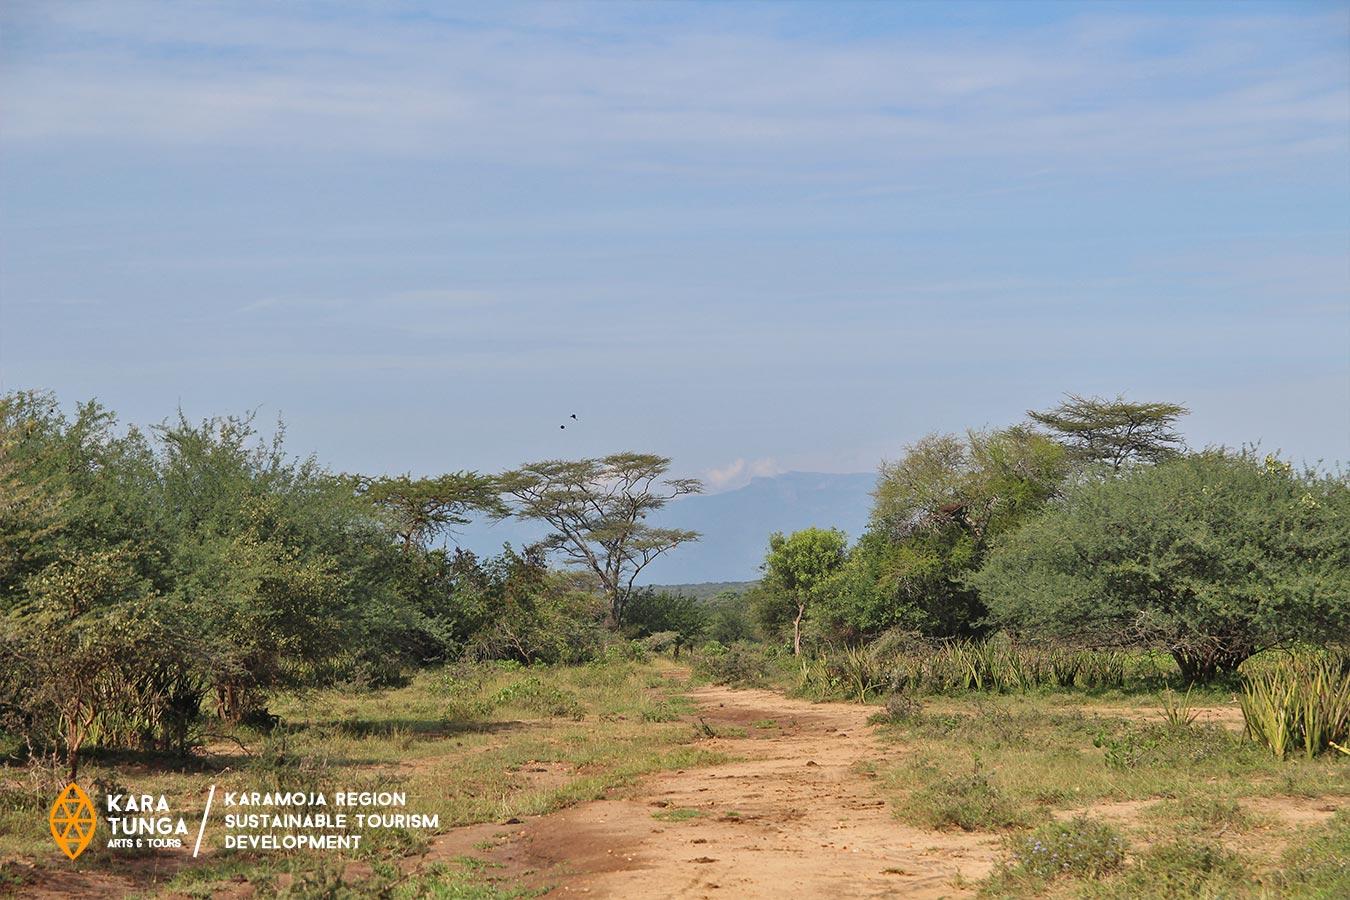 kara-tunga-karamoja-uganda-tours-kalia-peace-village-amudat-pokot-culture-15